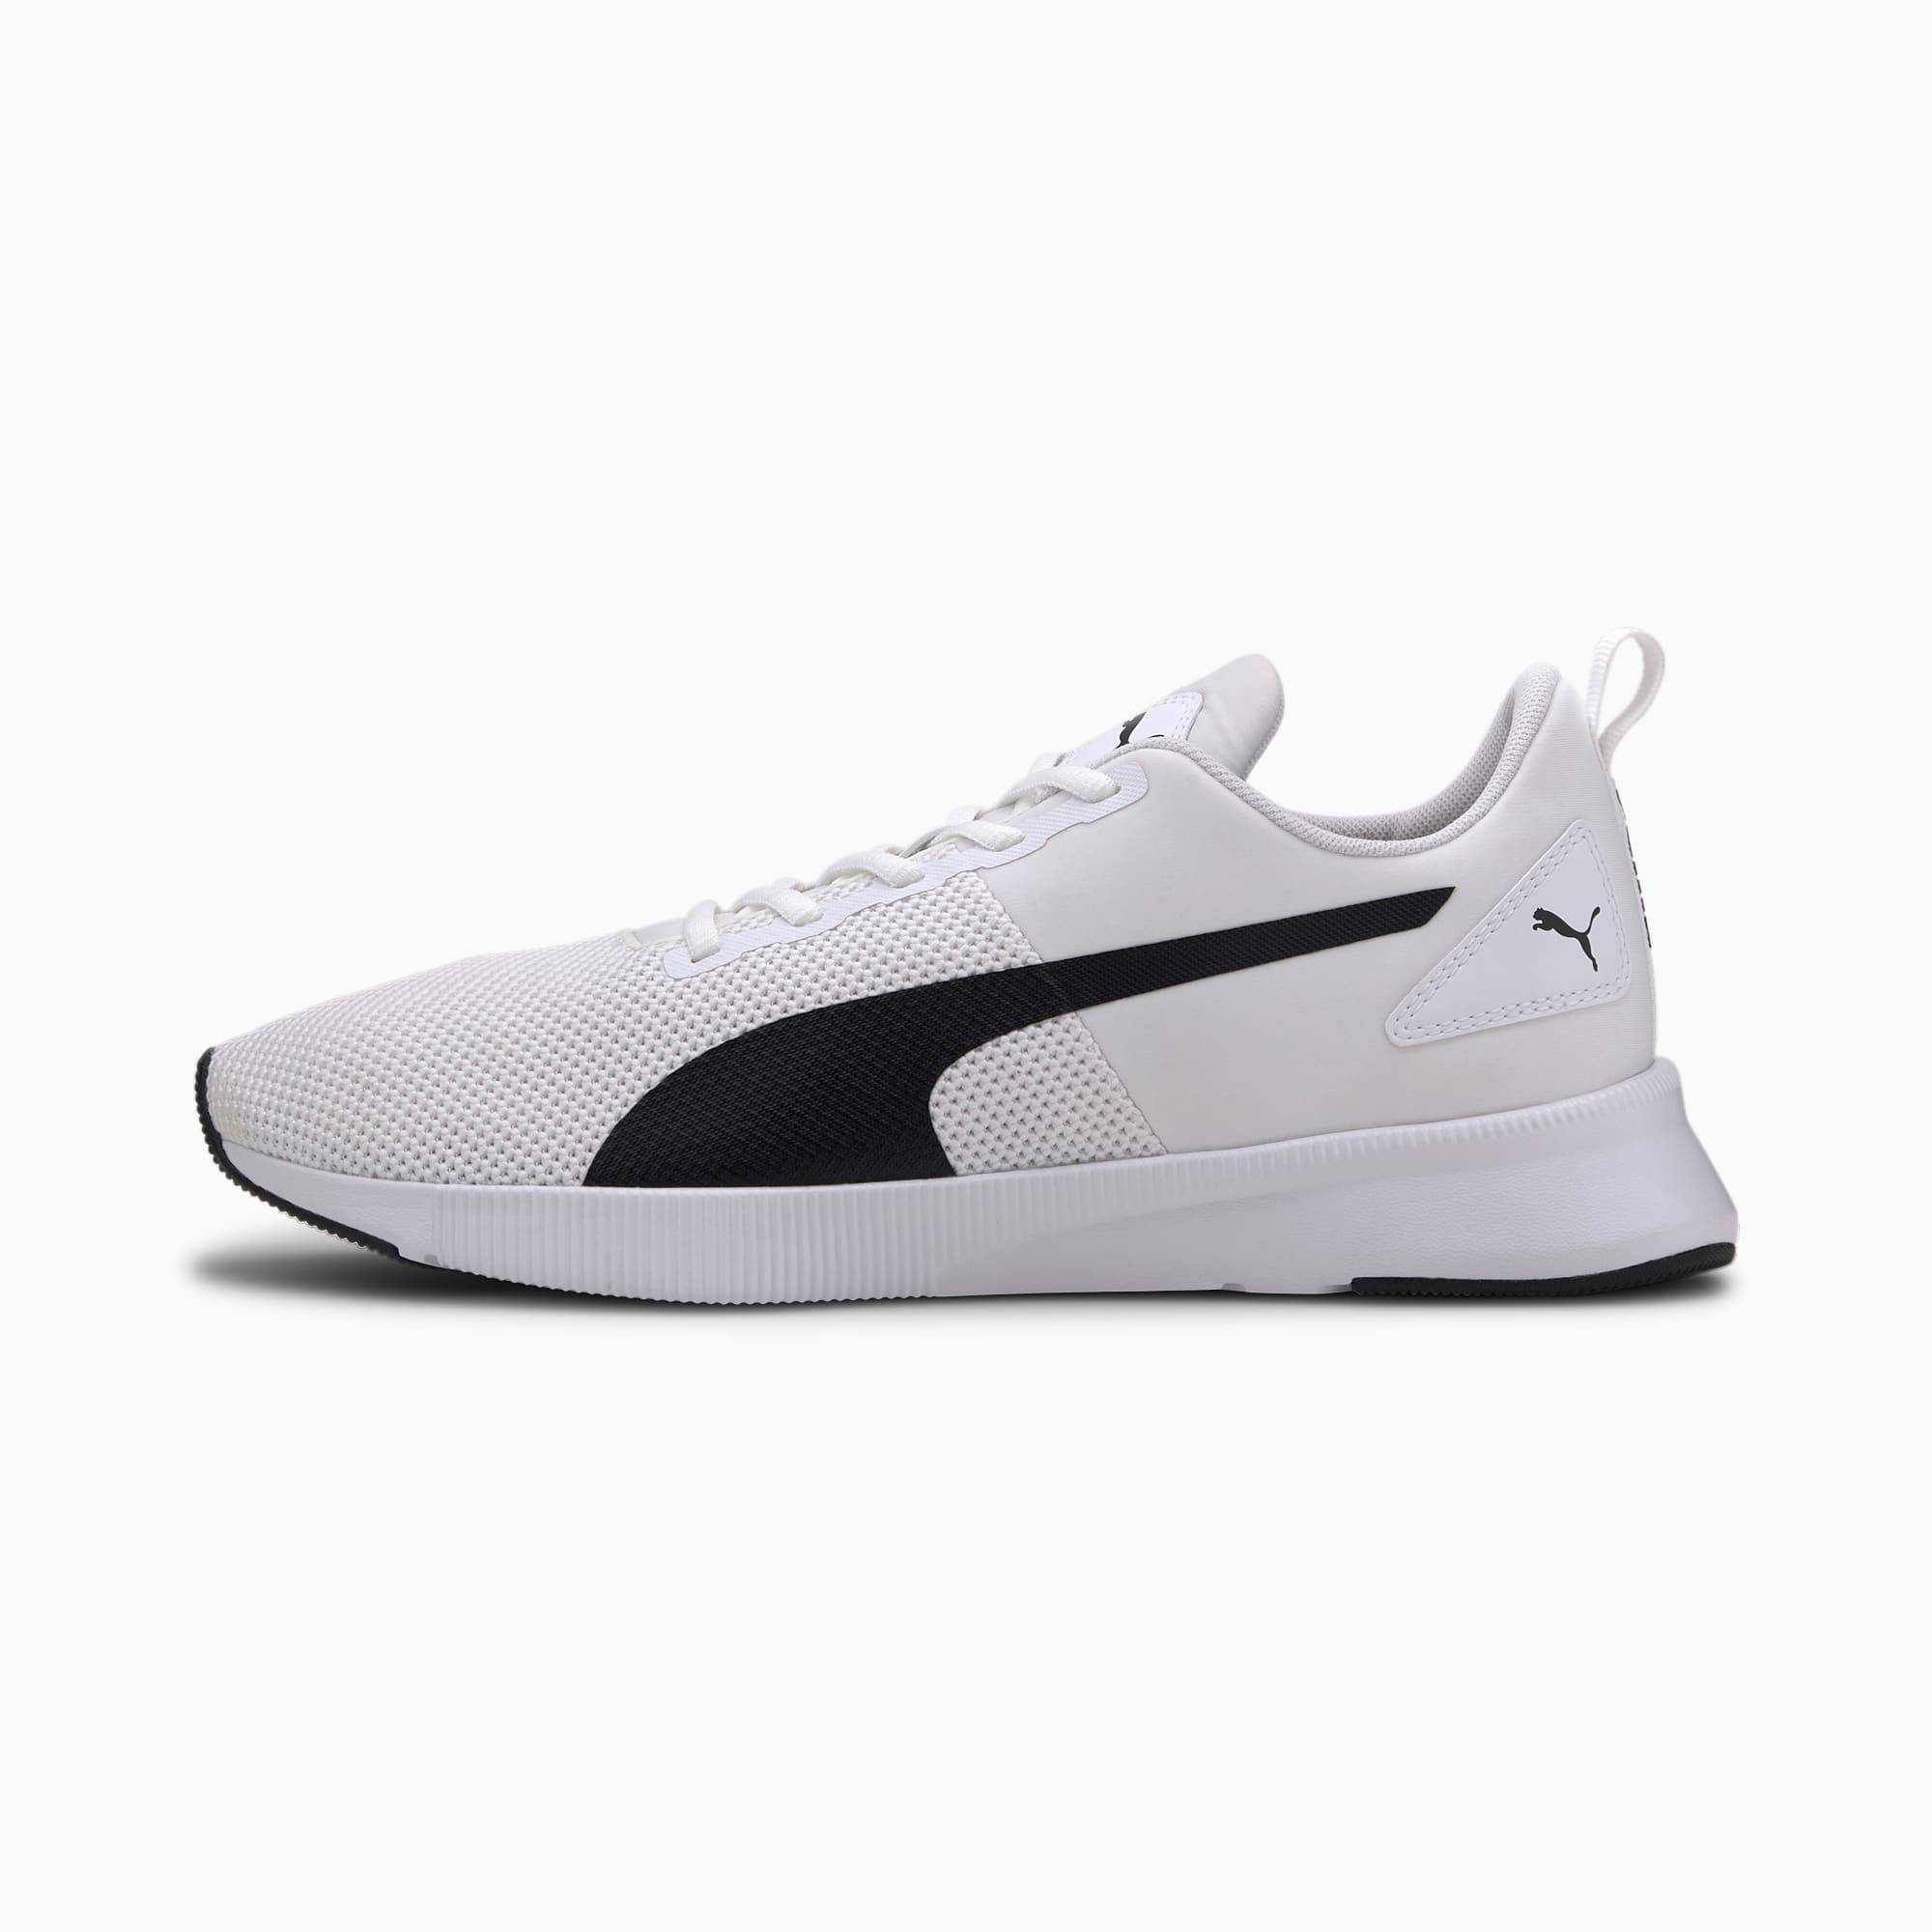 PUMA Chaussure de course Flyer Runner, Blanc/Noir, Taille 37.5, Chaussures